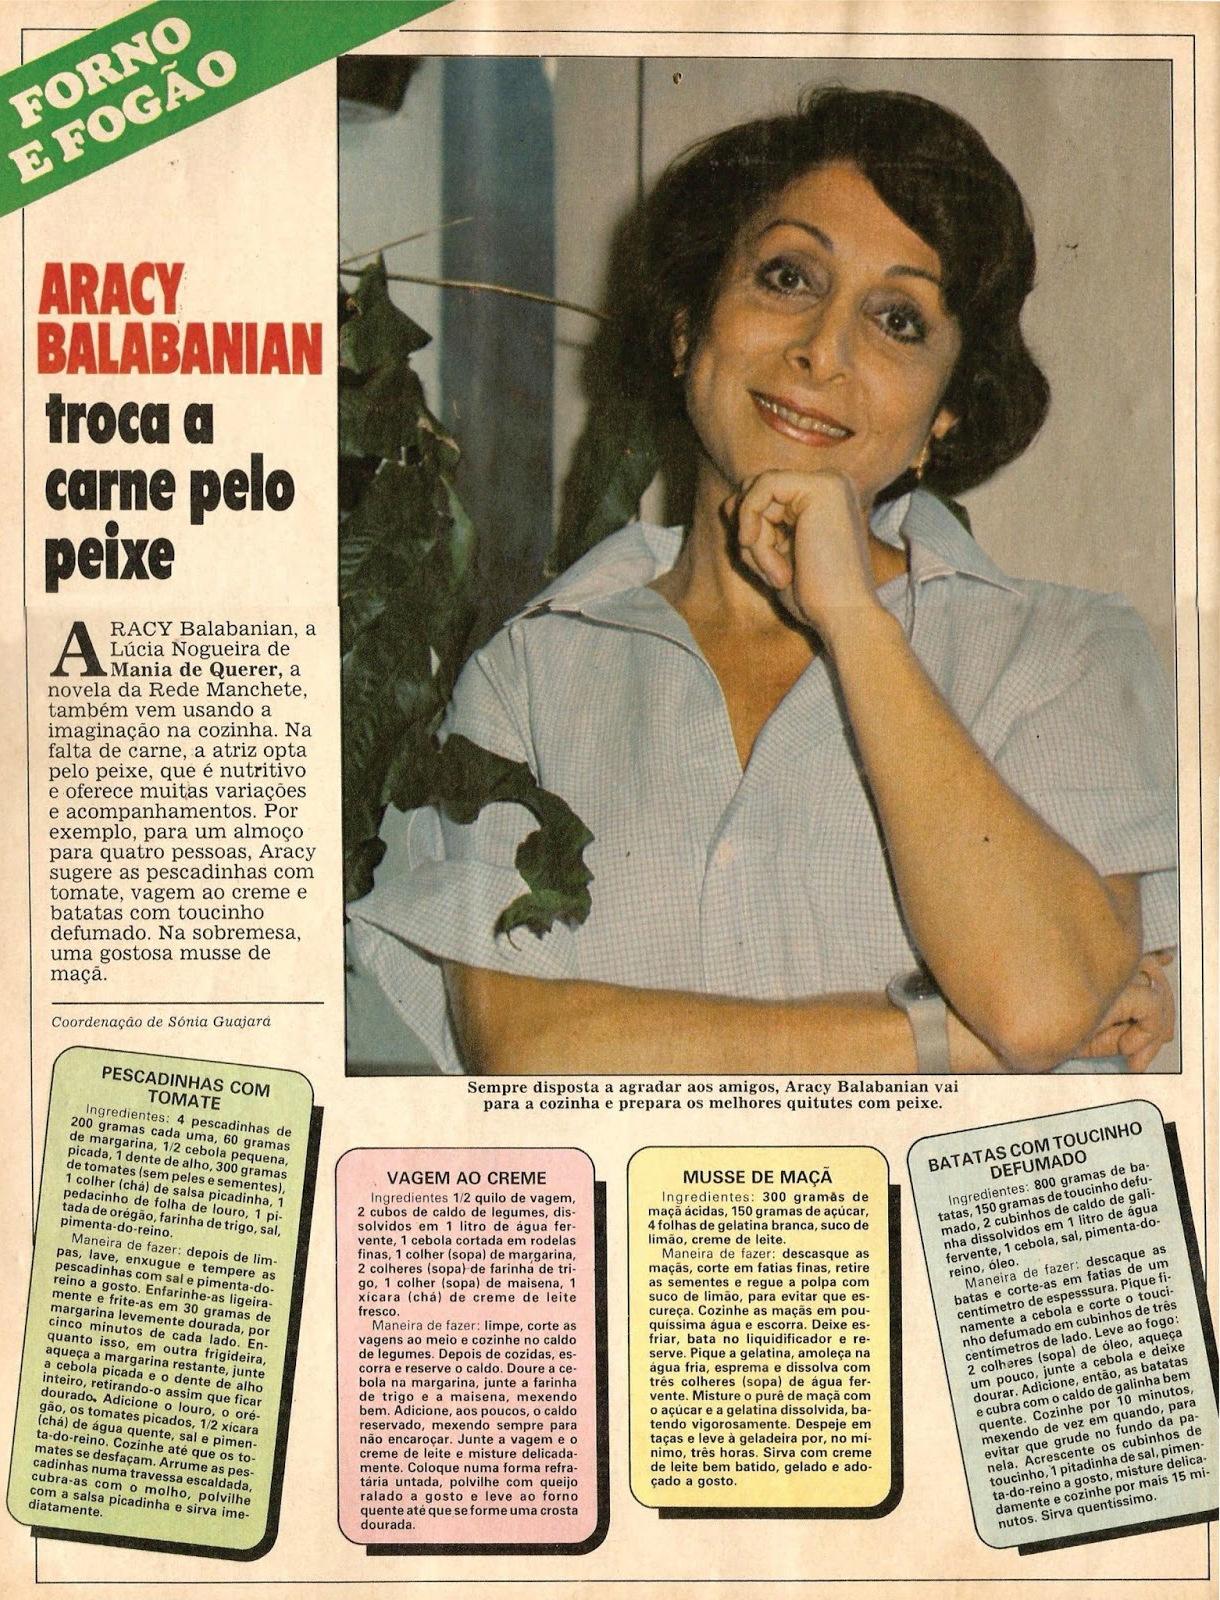 Aracy Balabanian Awesome revista amiga e novelas: aracy balabanian